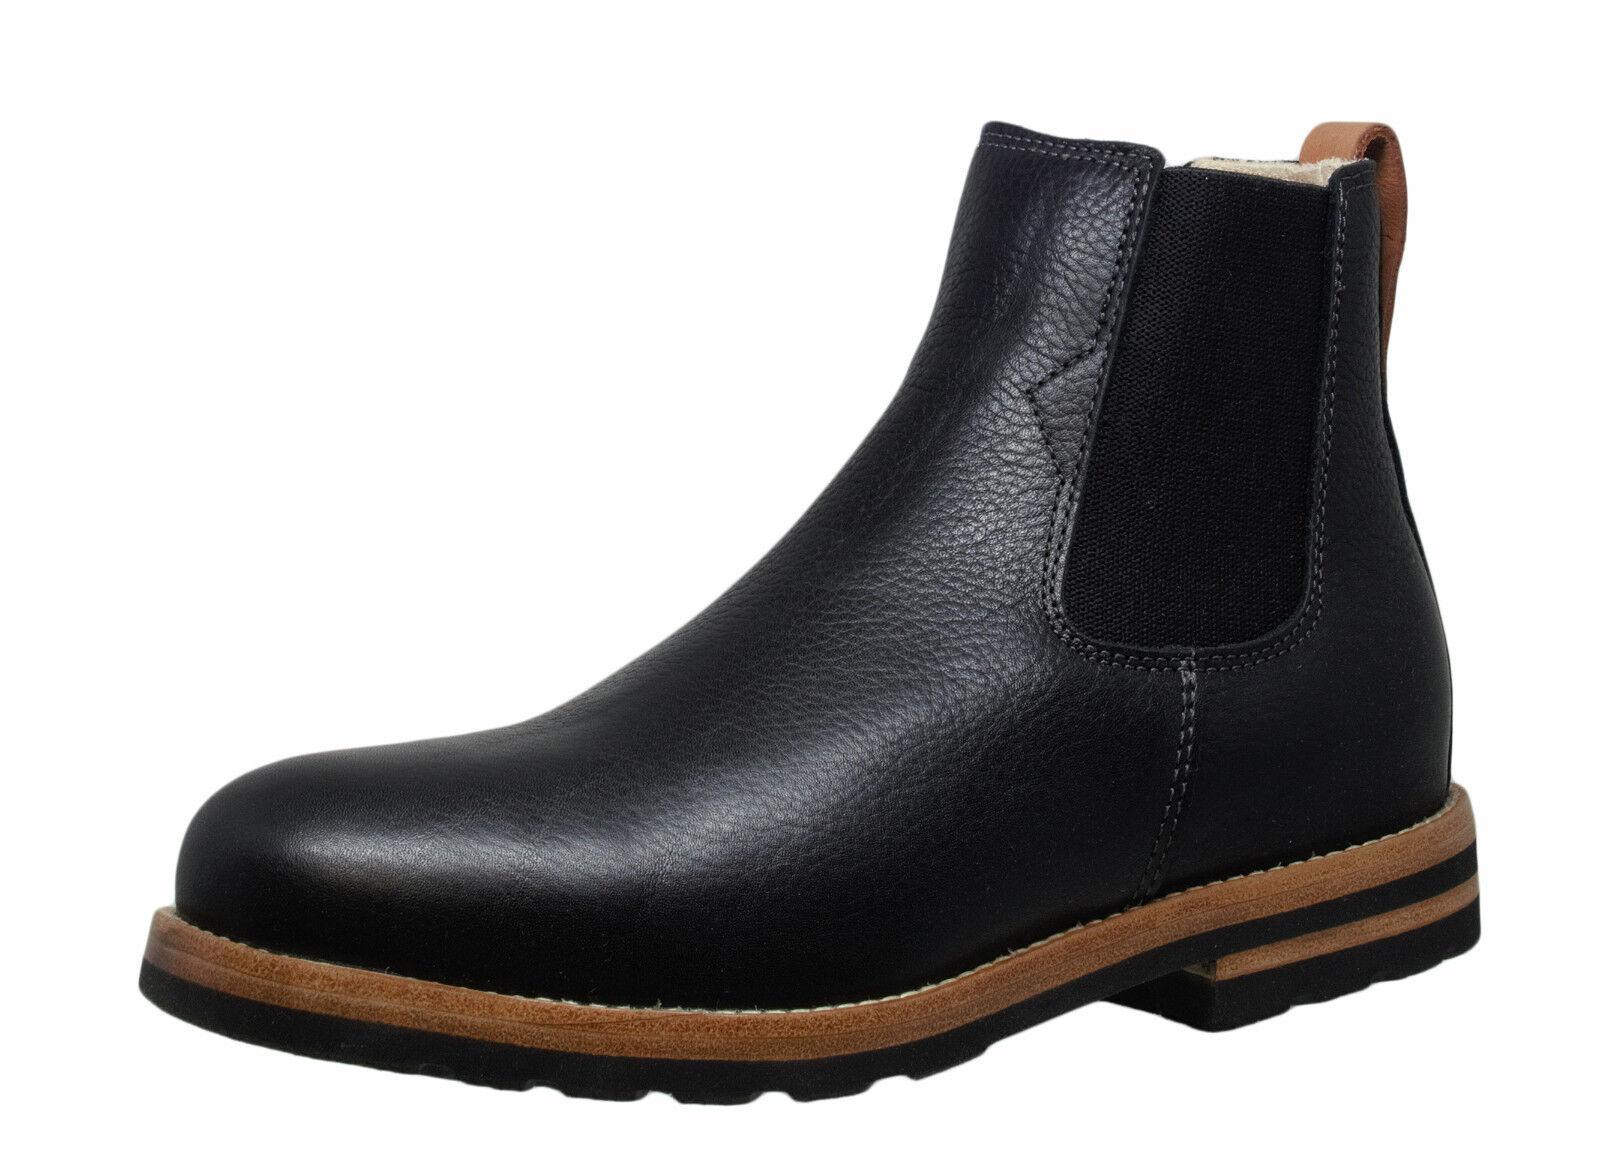 Kavat H W 2018 Mastad Mastad Mastad Chelsea Stiefel Stiefel Leder schwarz Gr. 36 - 41 Neu 9a1c83